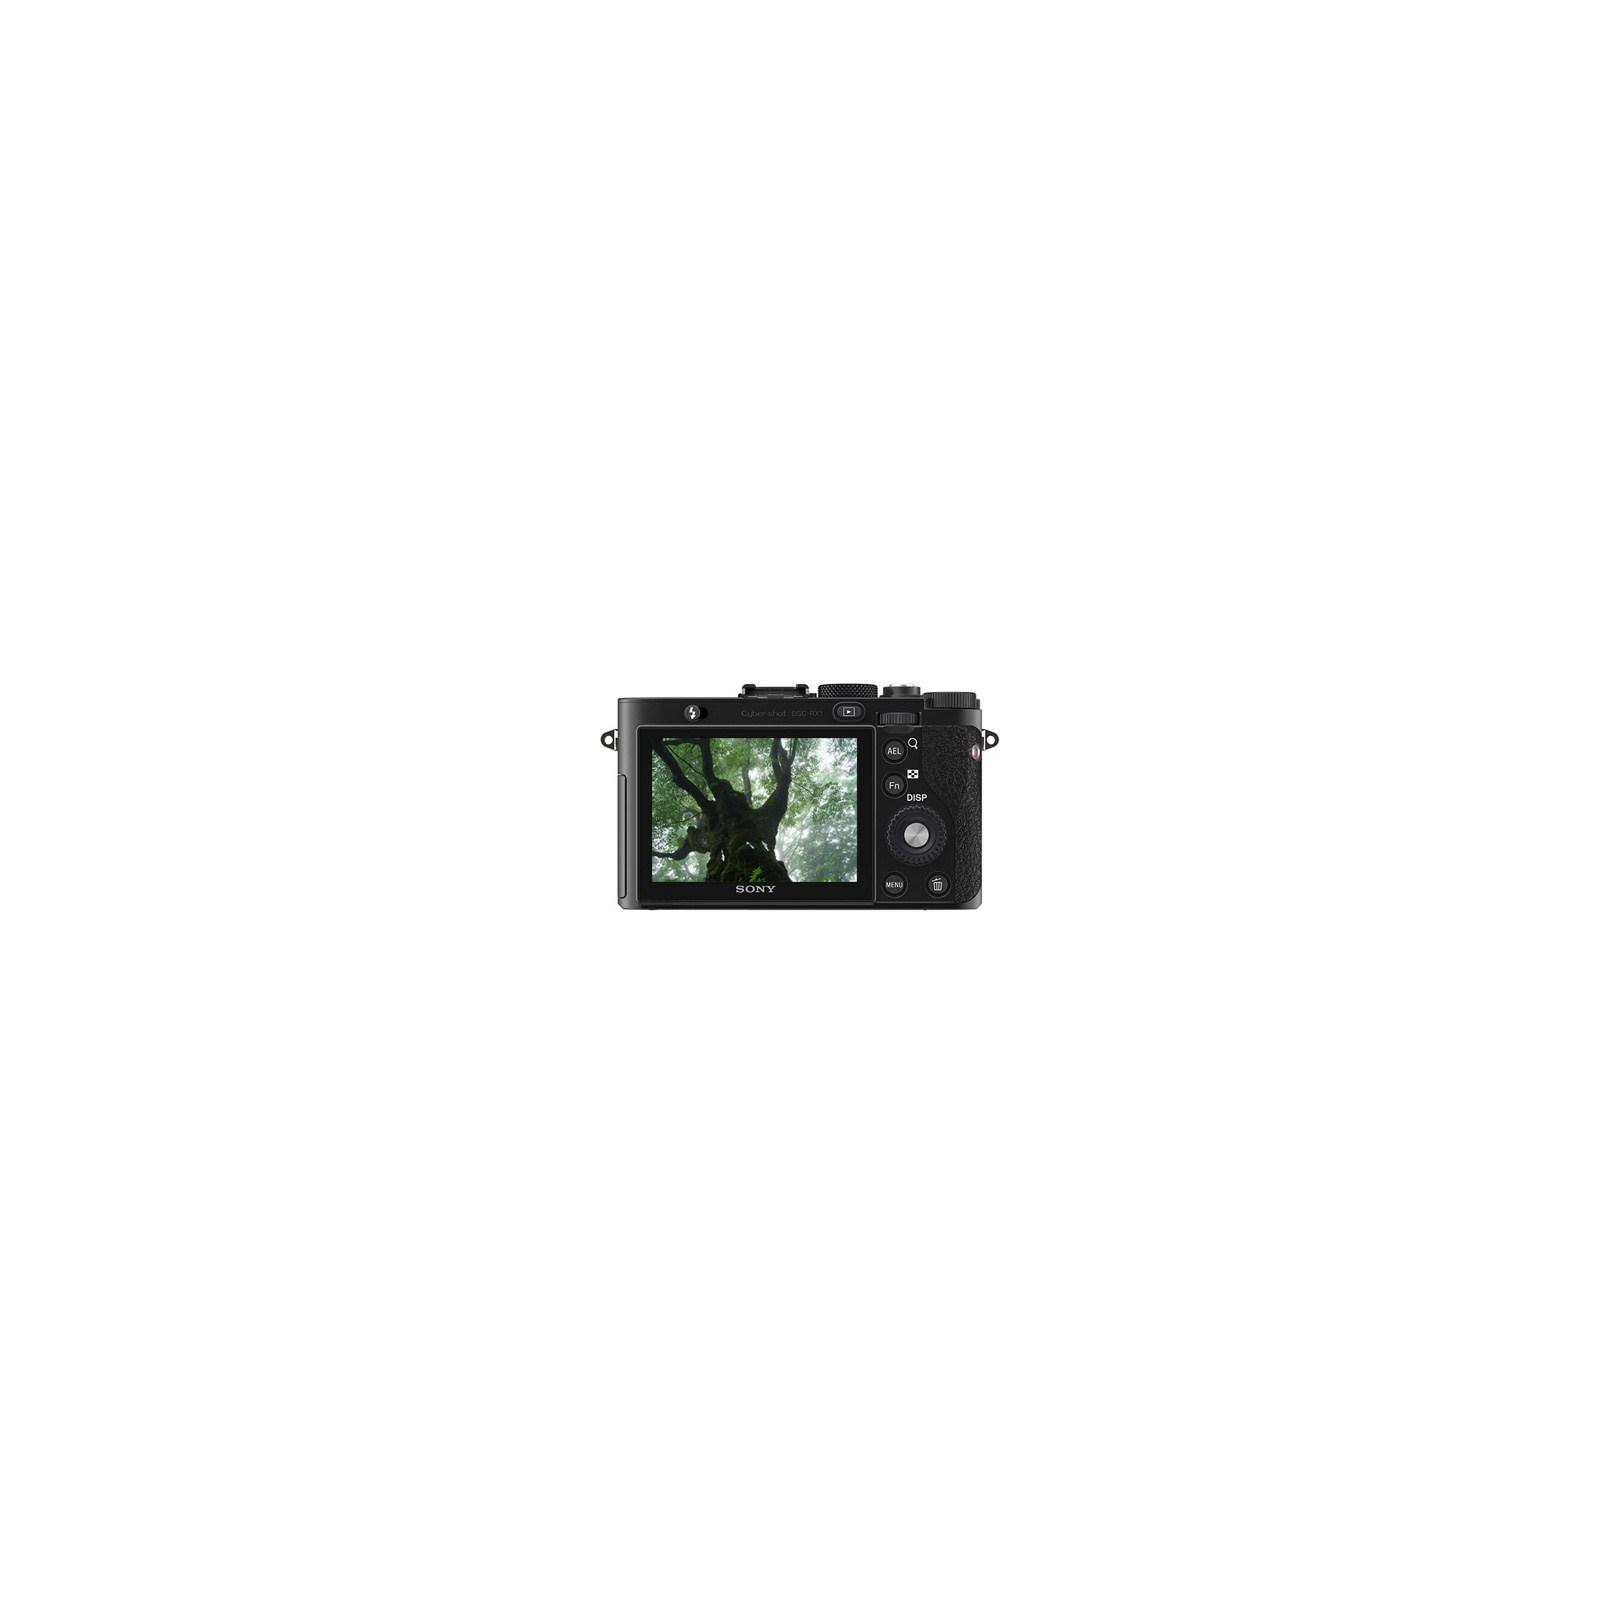 Цифровой фотоаппарат SONY Cyber-shot DSC-RX1R (DSCRX1R.CE3) изображение 2